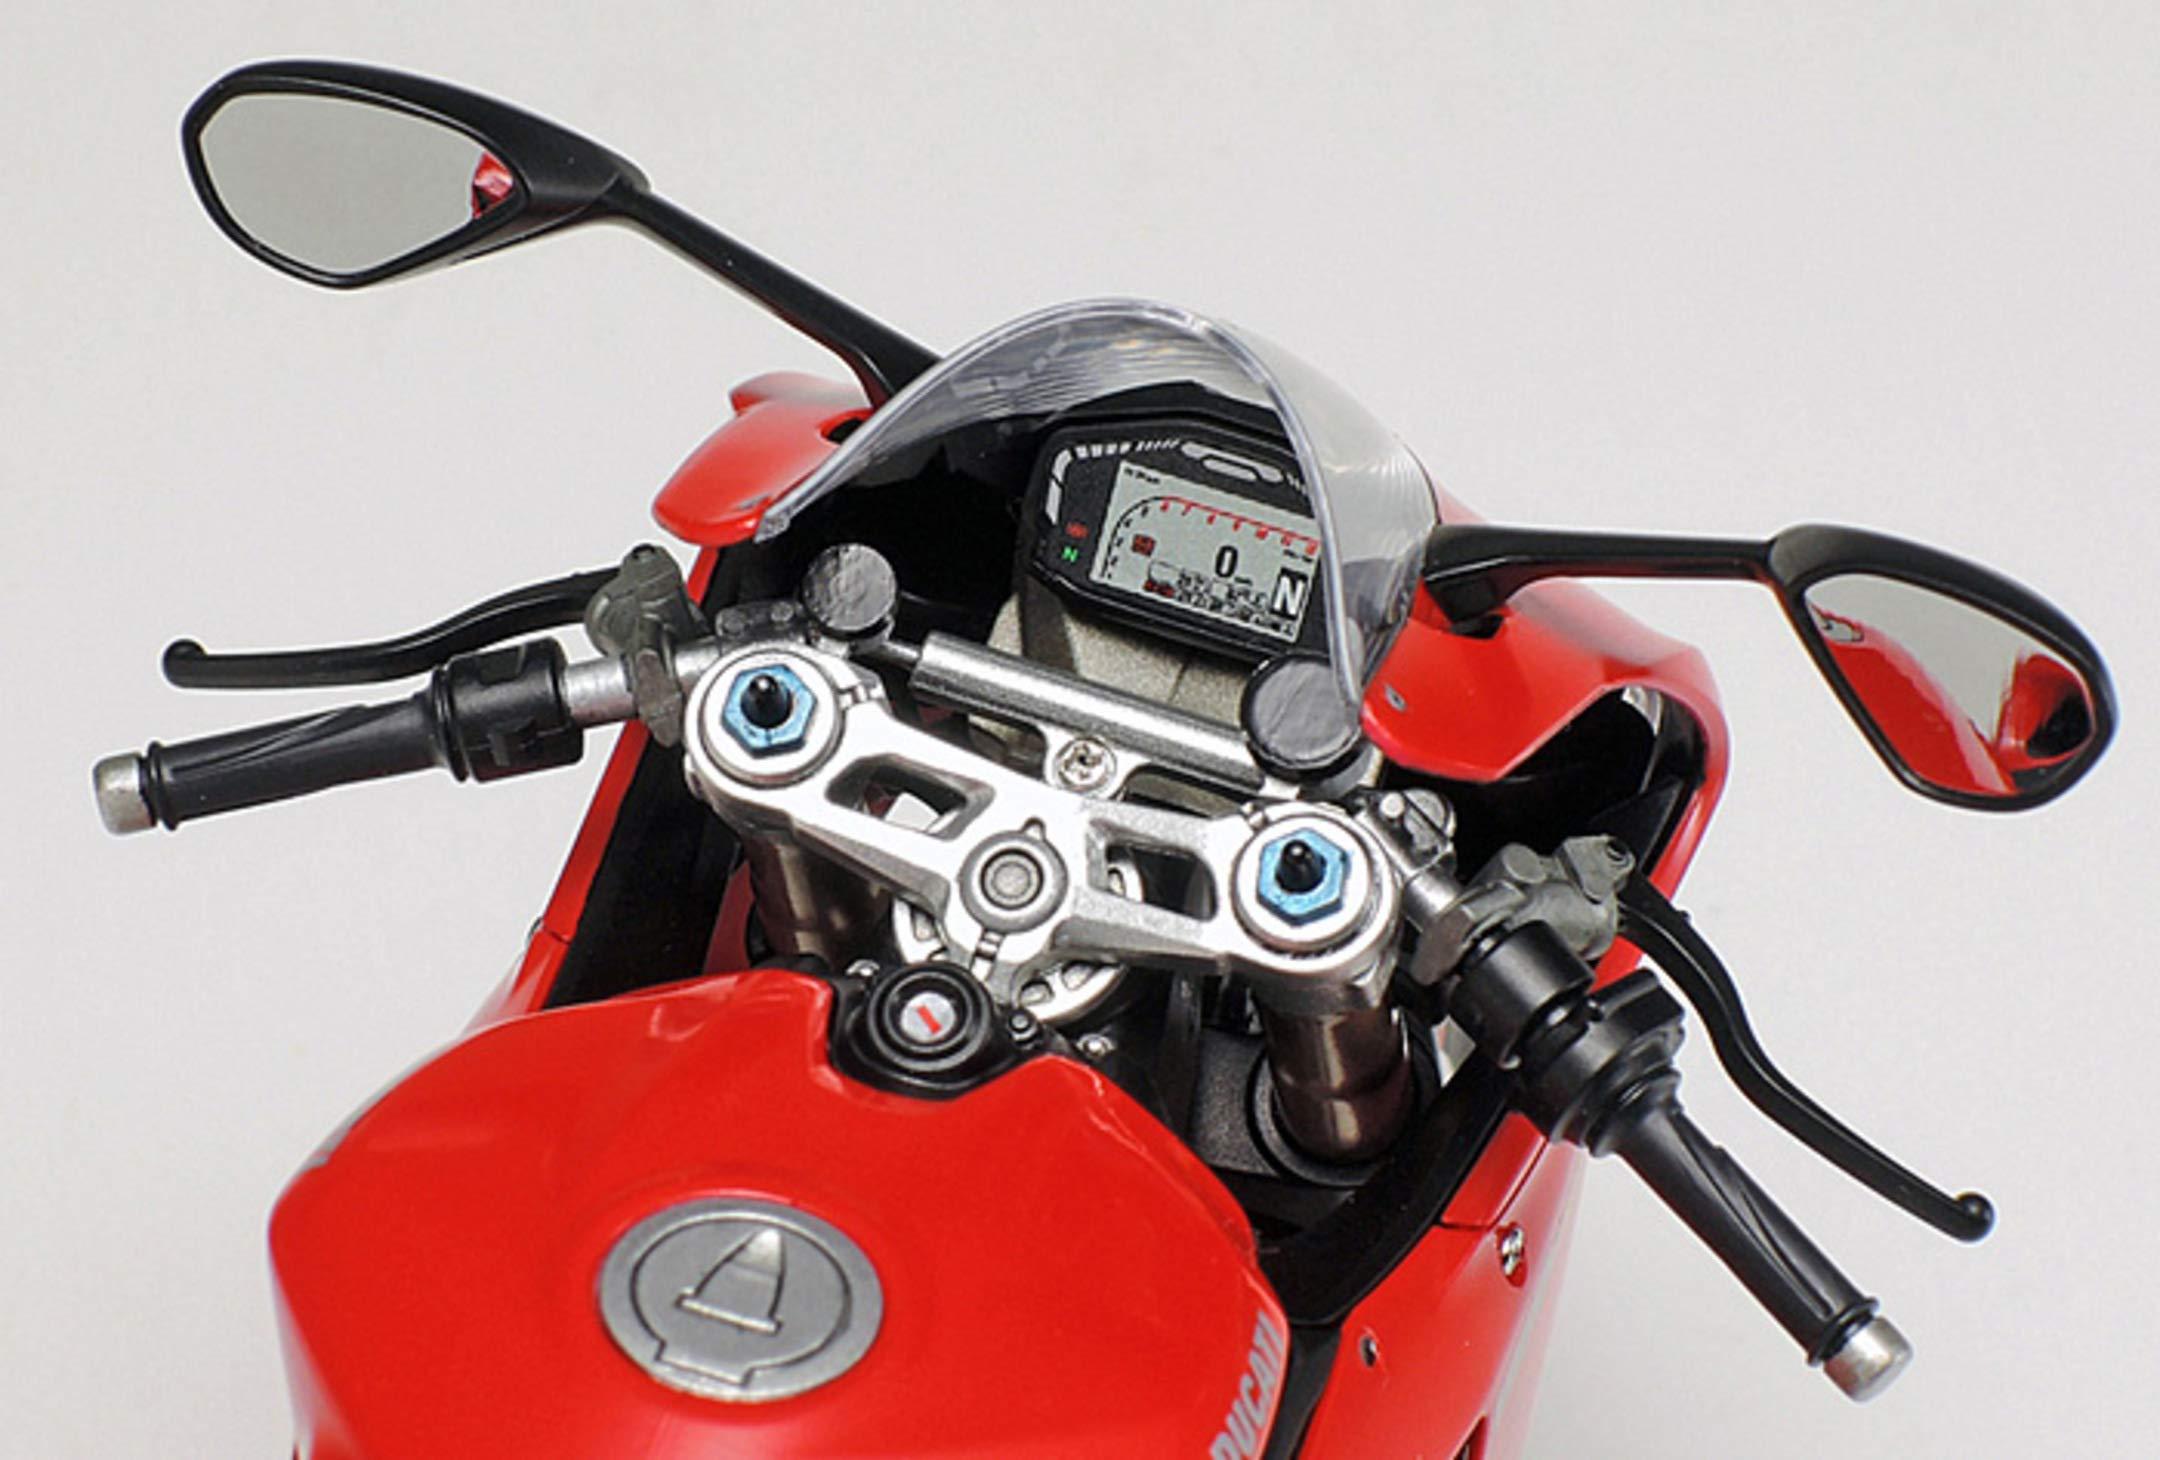 Tamiya 14129 1:12 Ducati 1199 Panigale S Model 8